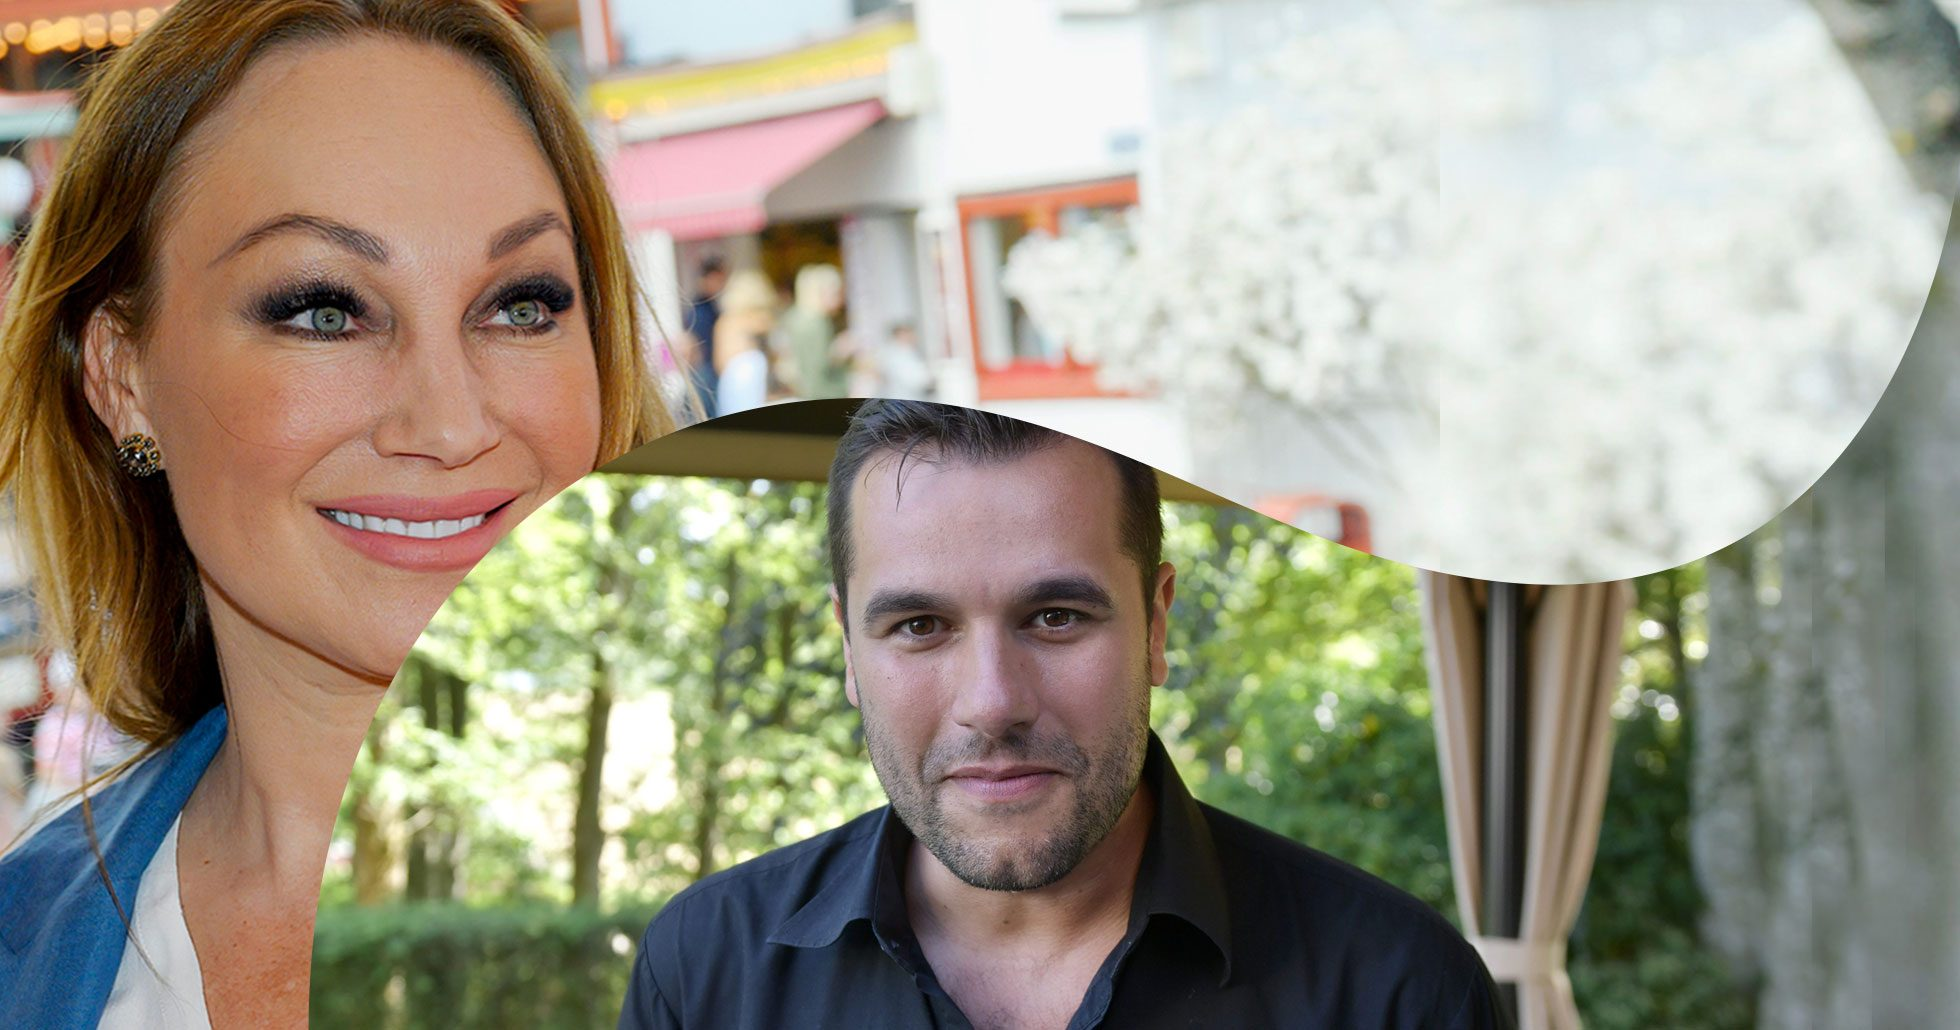 Charlotte Perrelli och Edward af Sillén kommenterar Eurovison Song Contest 2019 i SVT